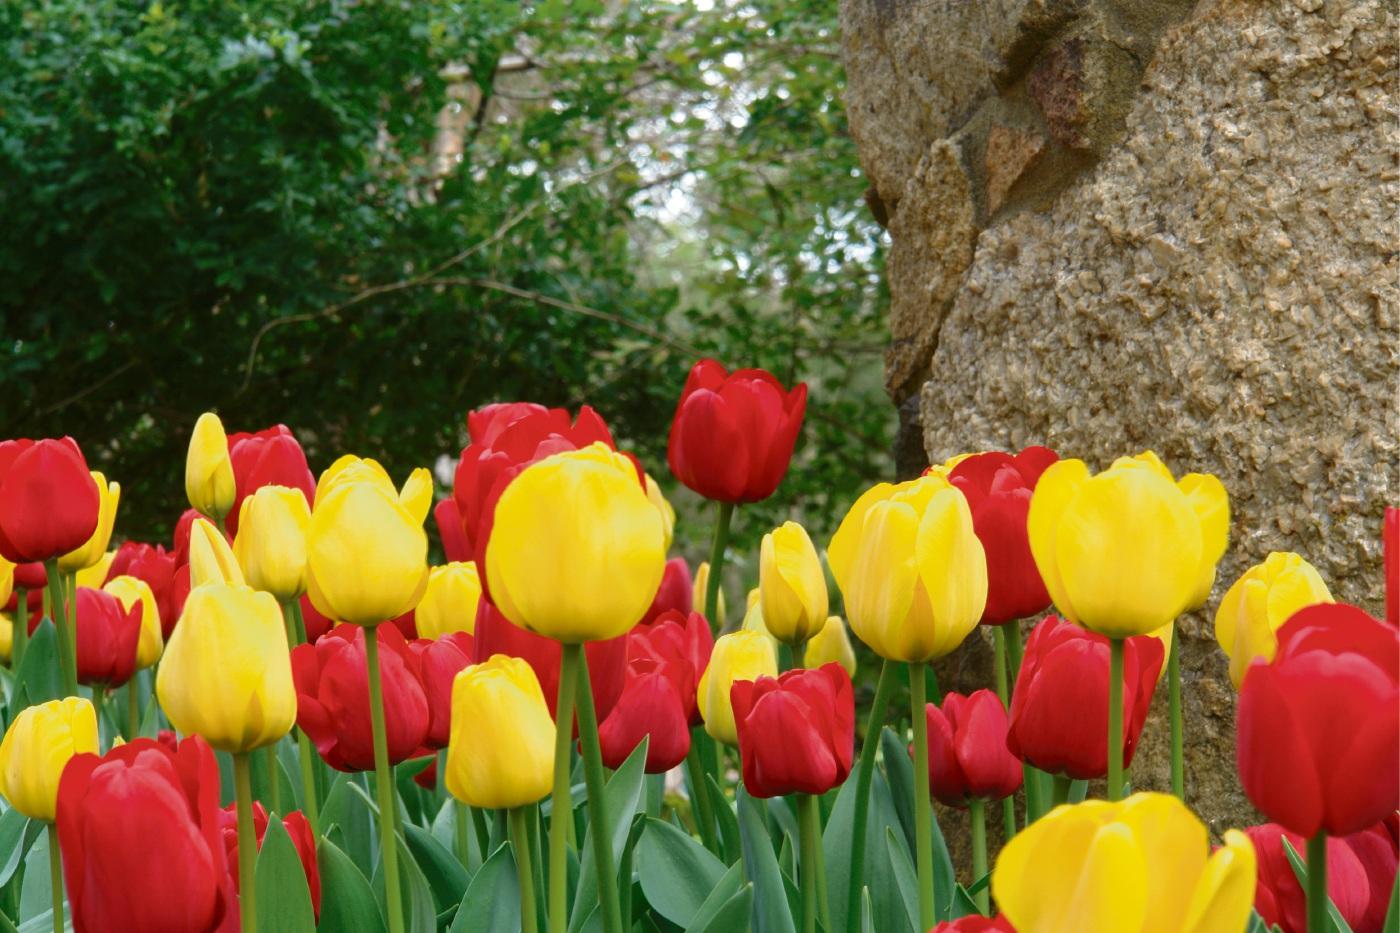 The tulips at Araluen Botanic Park.